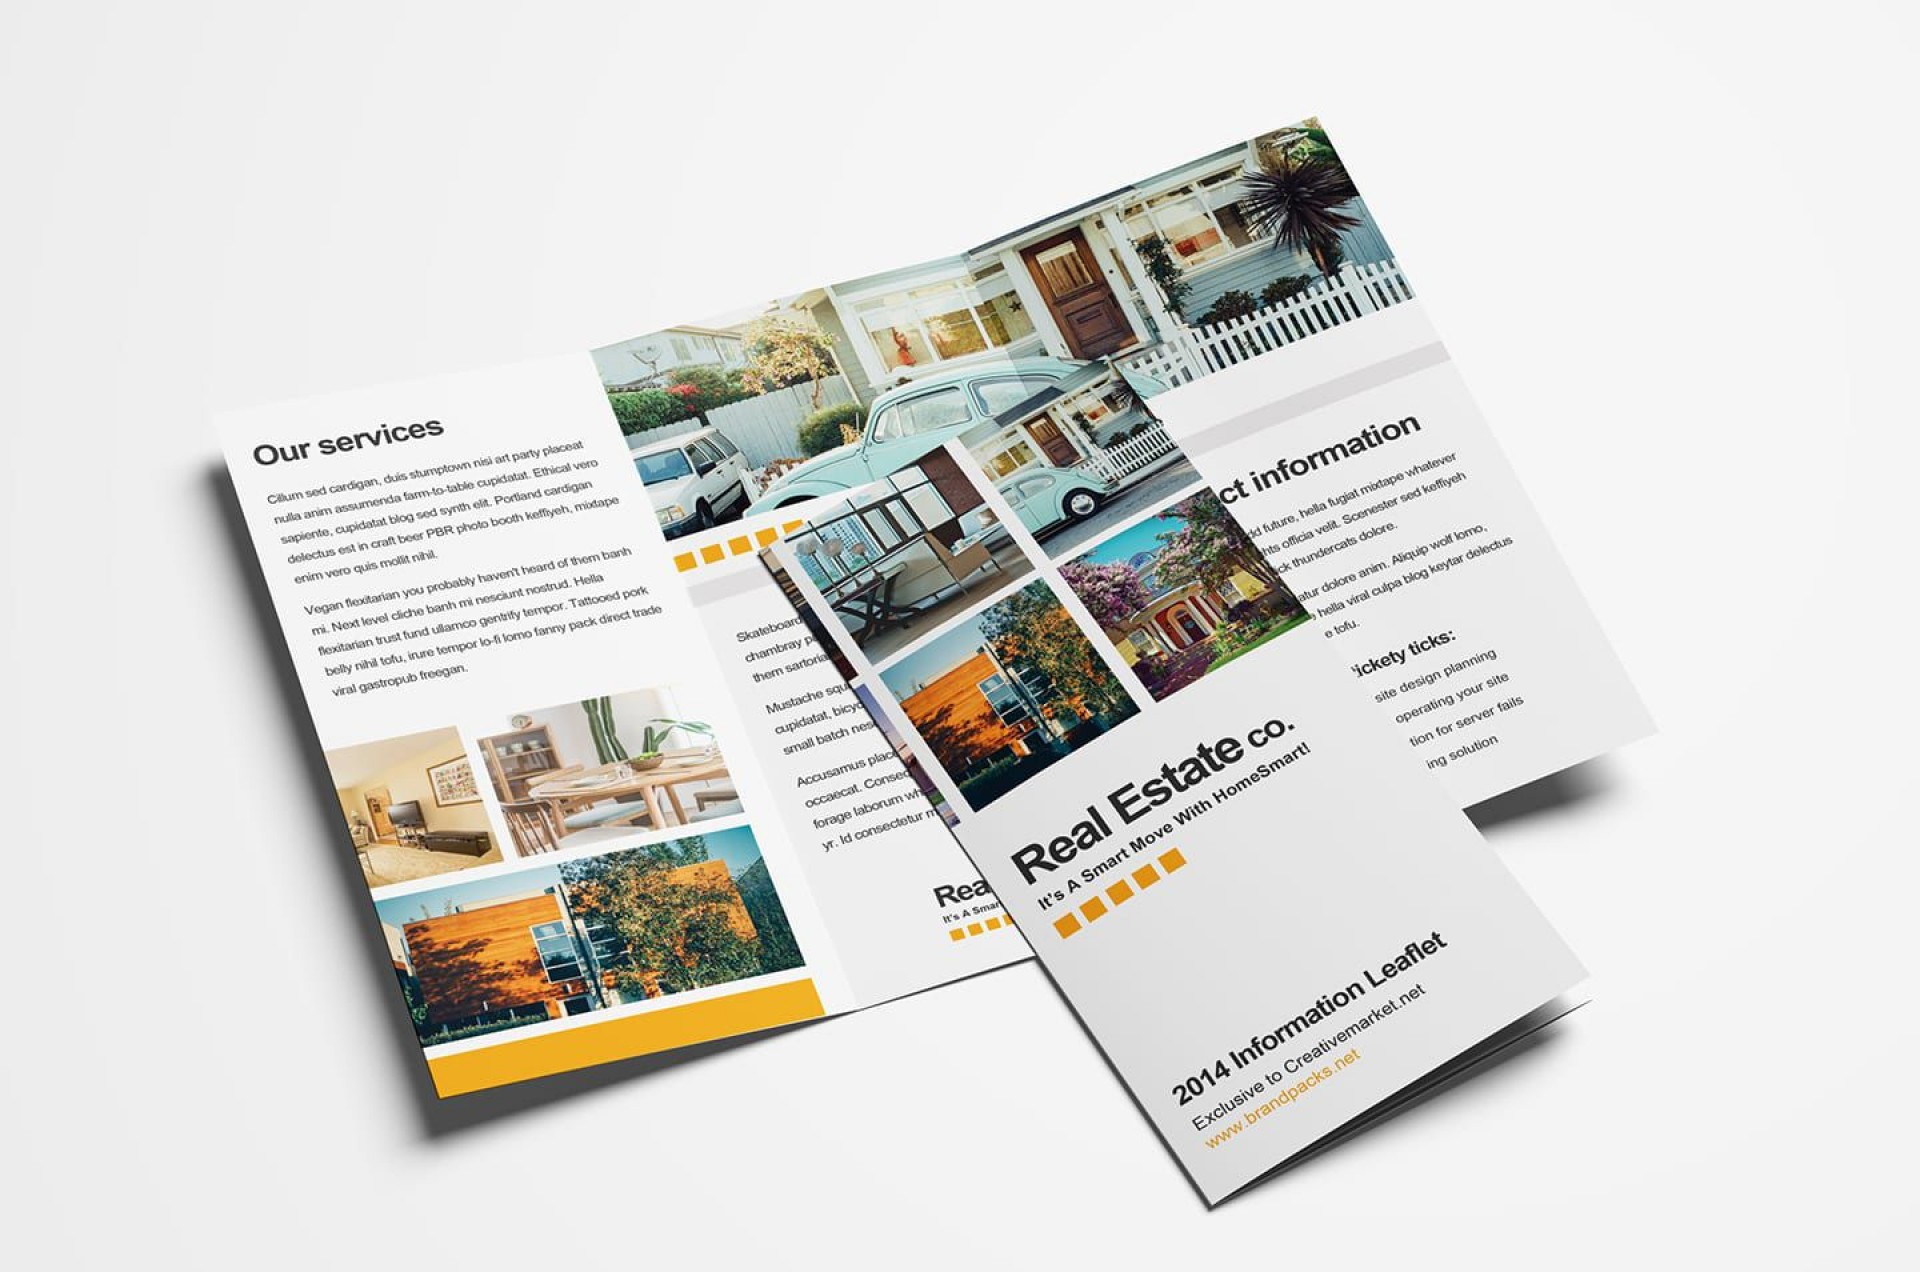 006 Astounding Three Fold Brochure Template Psd High Resolution  Free 3 A4 Tri Download1920